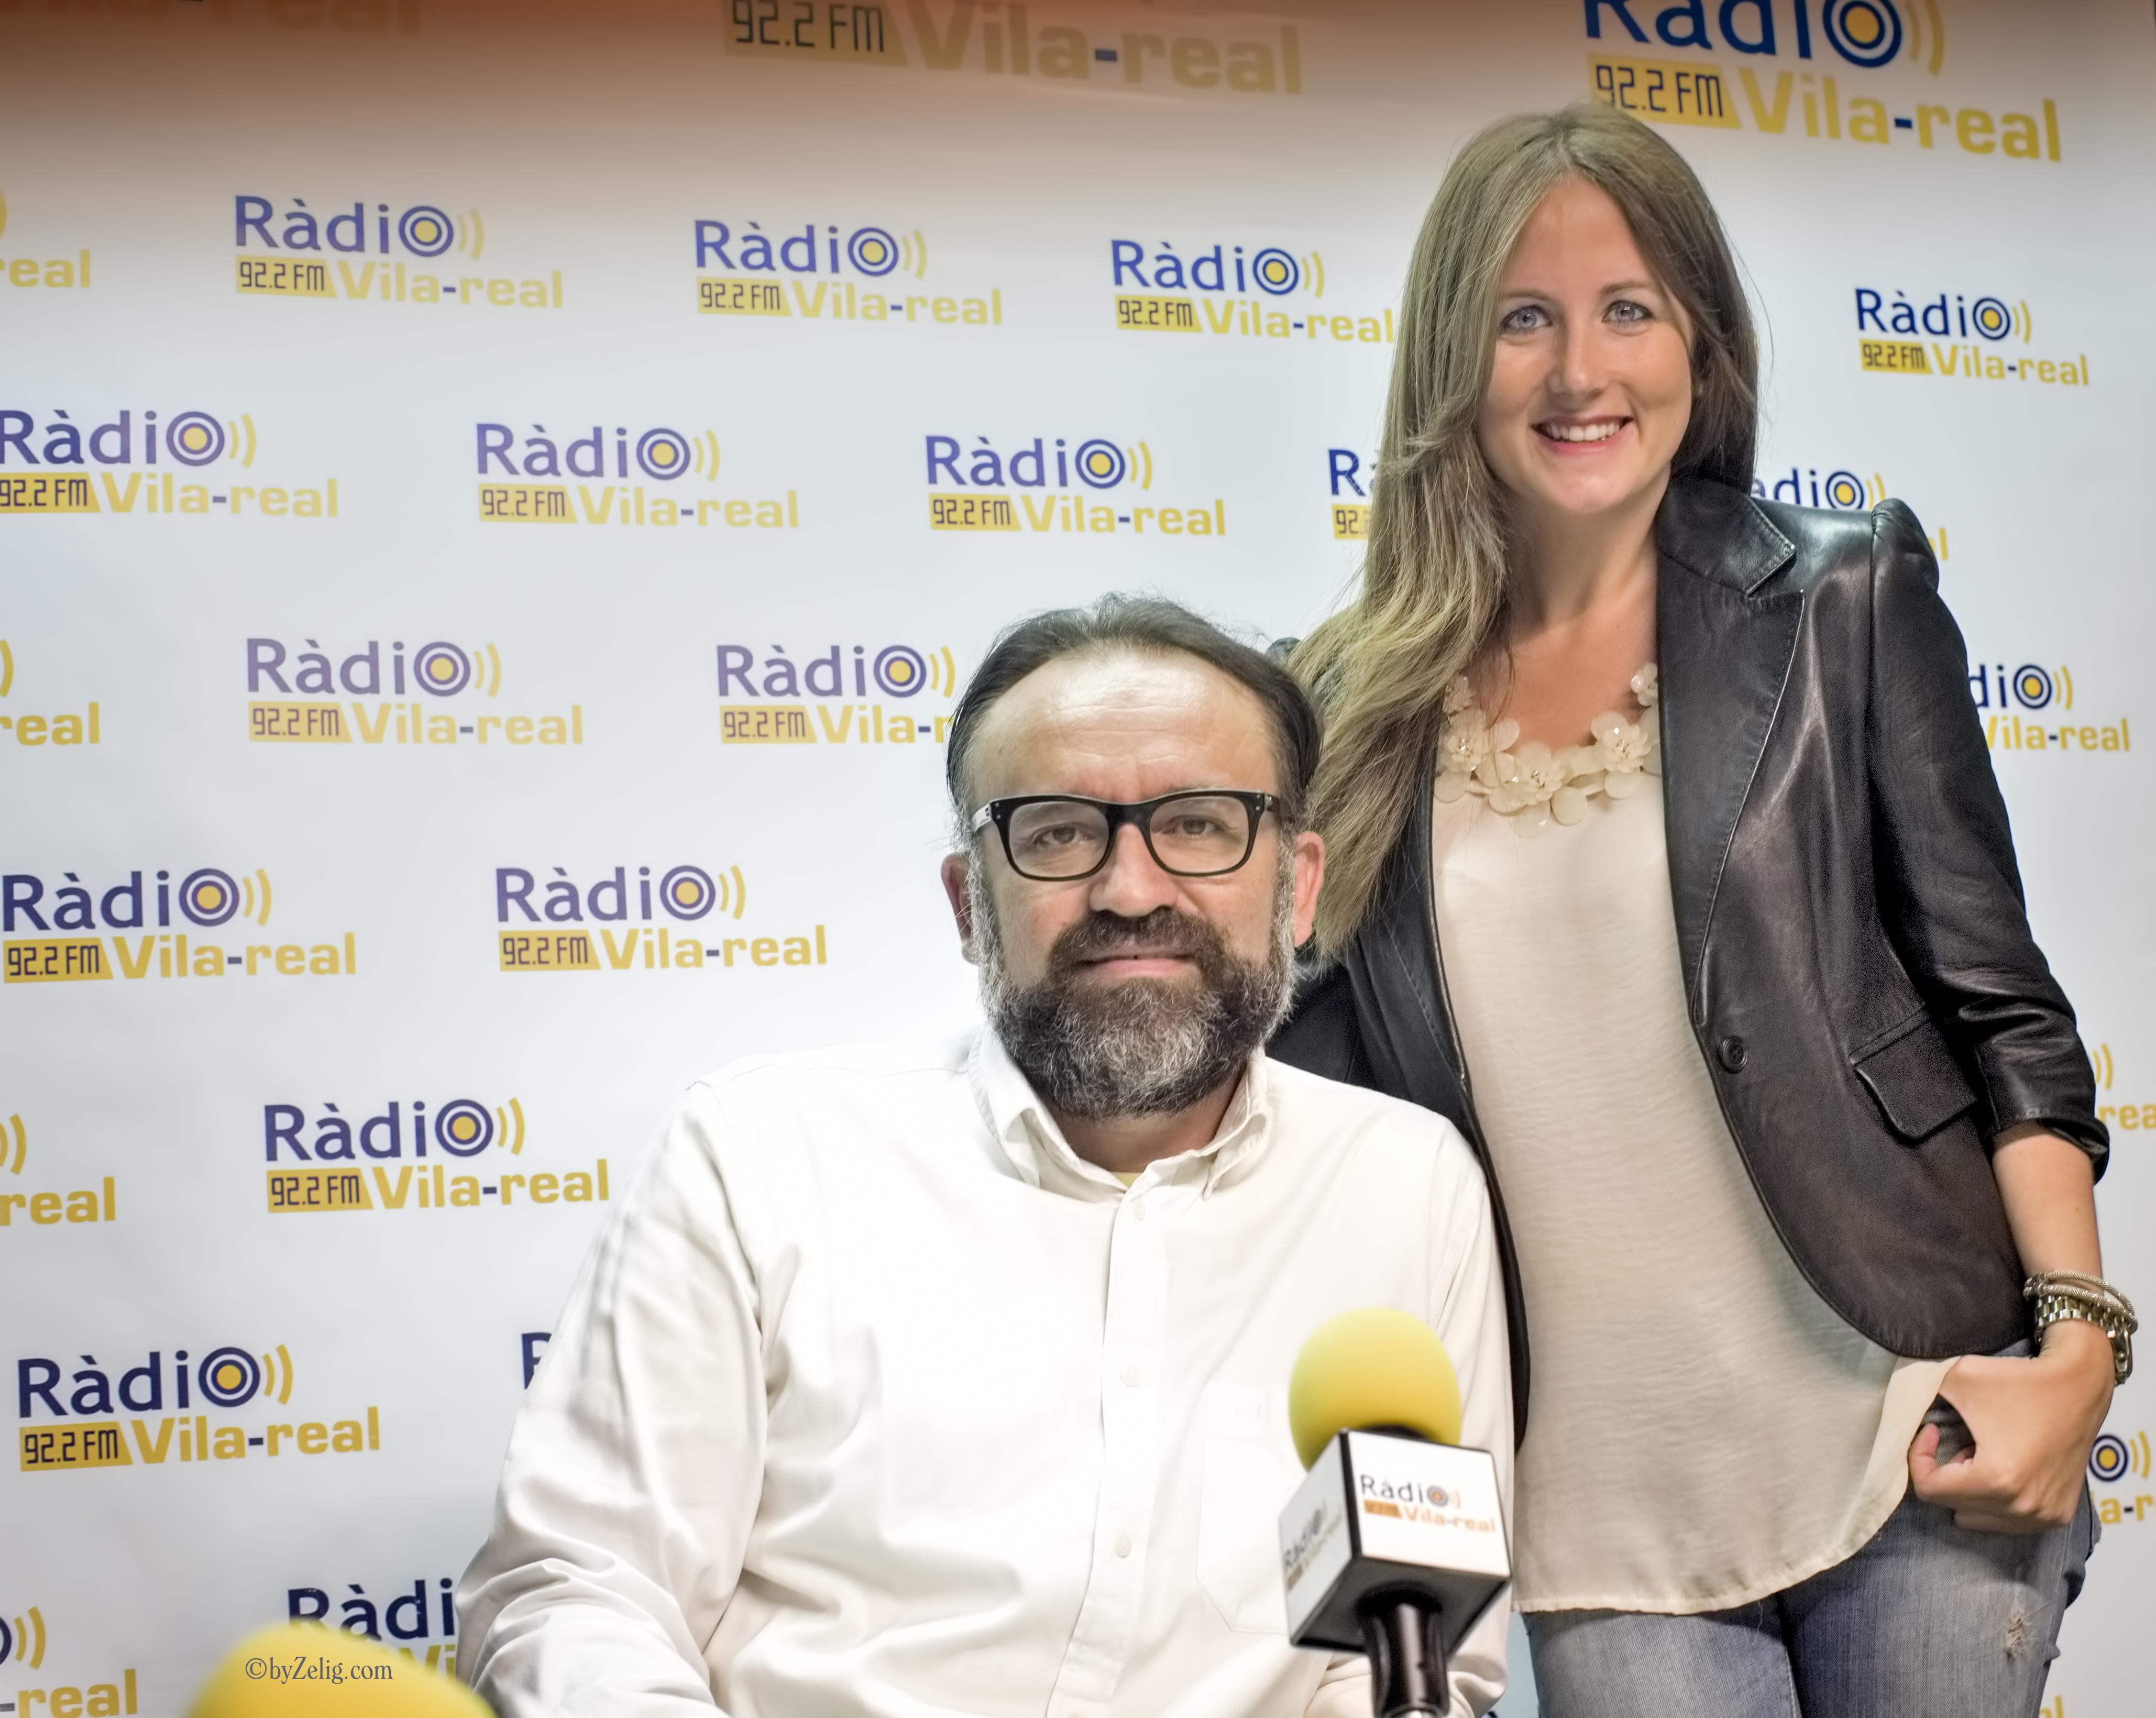 Esports Radio Vila-real. Programa del 20 de febrero 2018